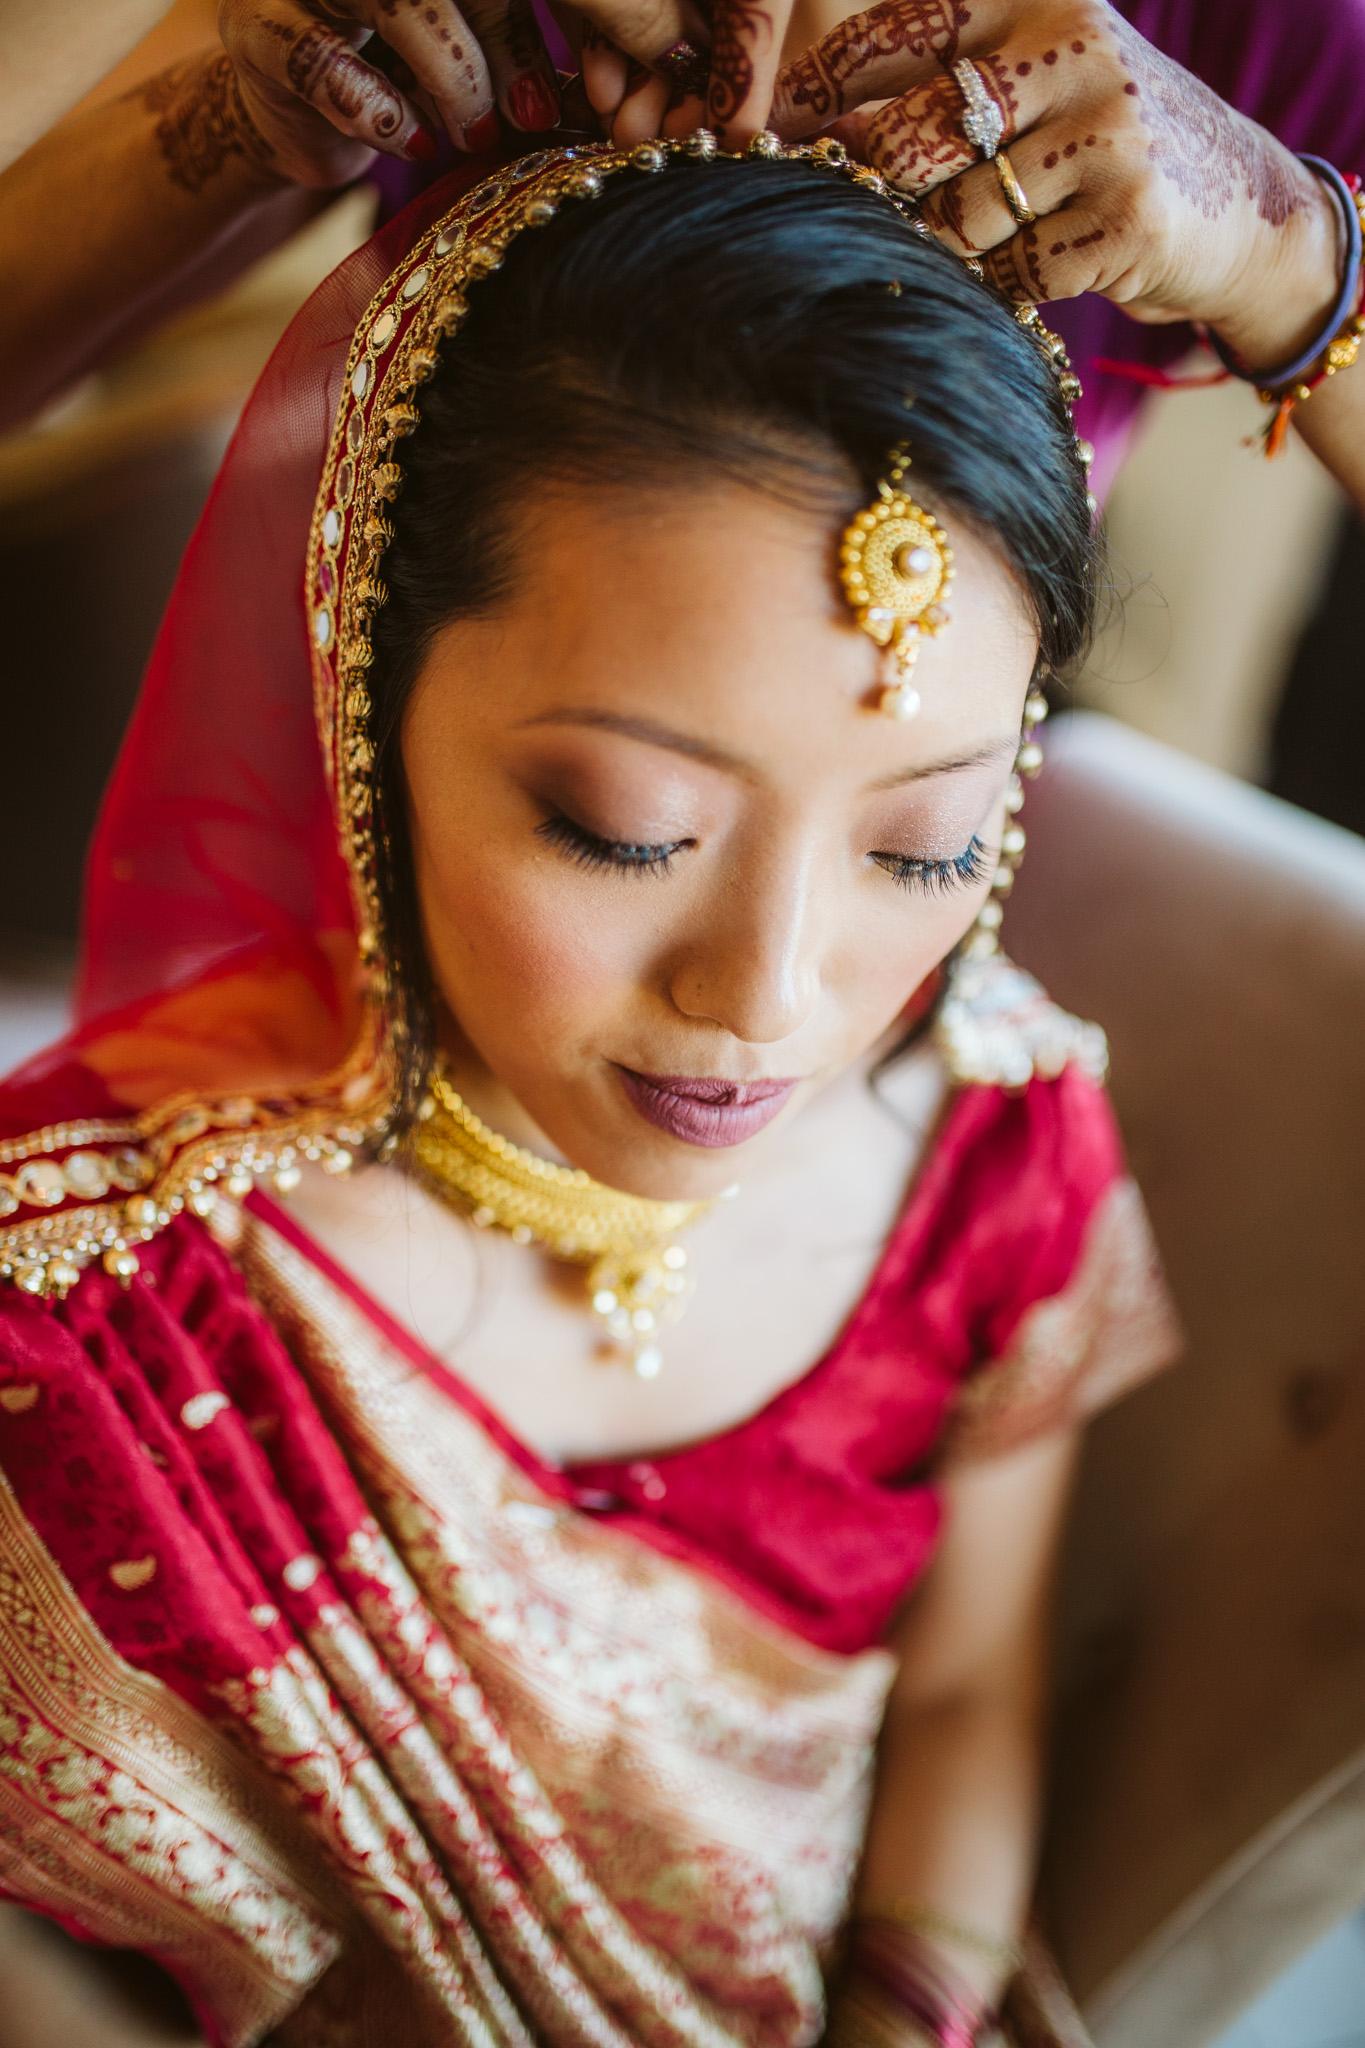 rebeccaburtphotography.hindiwedding.moraisvineyards.virginiawedding-35.JPG